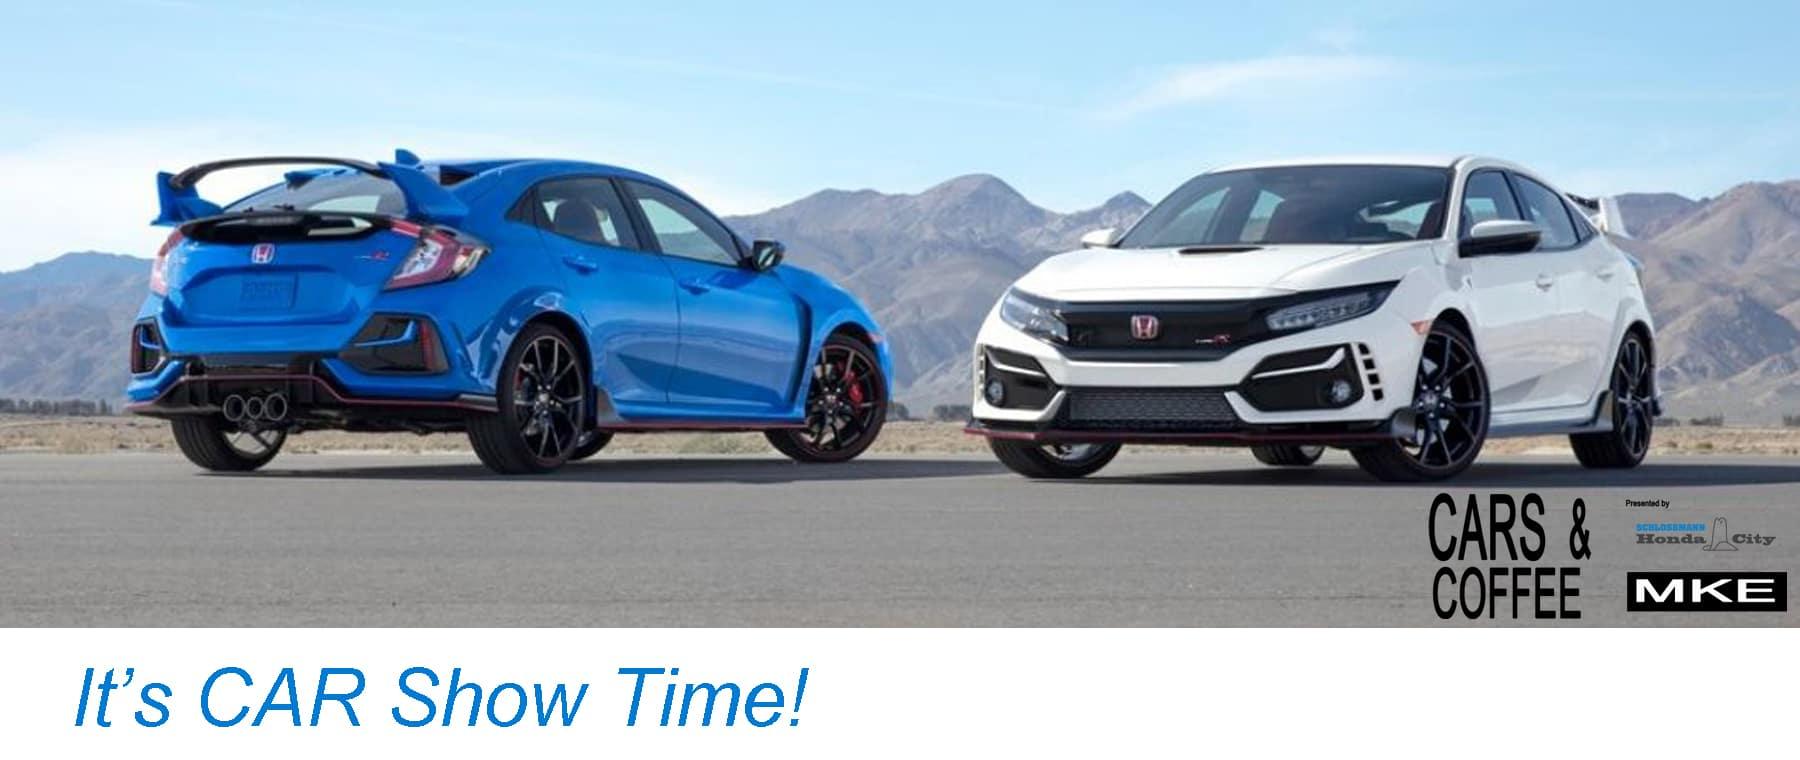 Honda City Cars and Coffee MKE Car Show